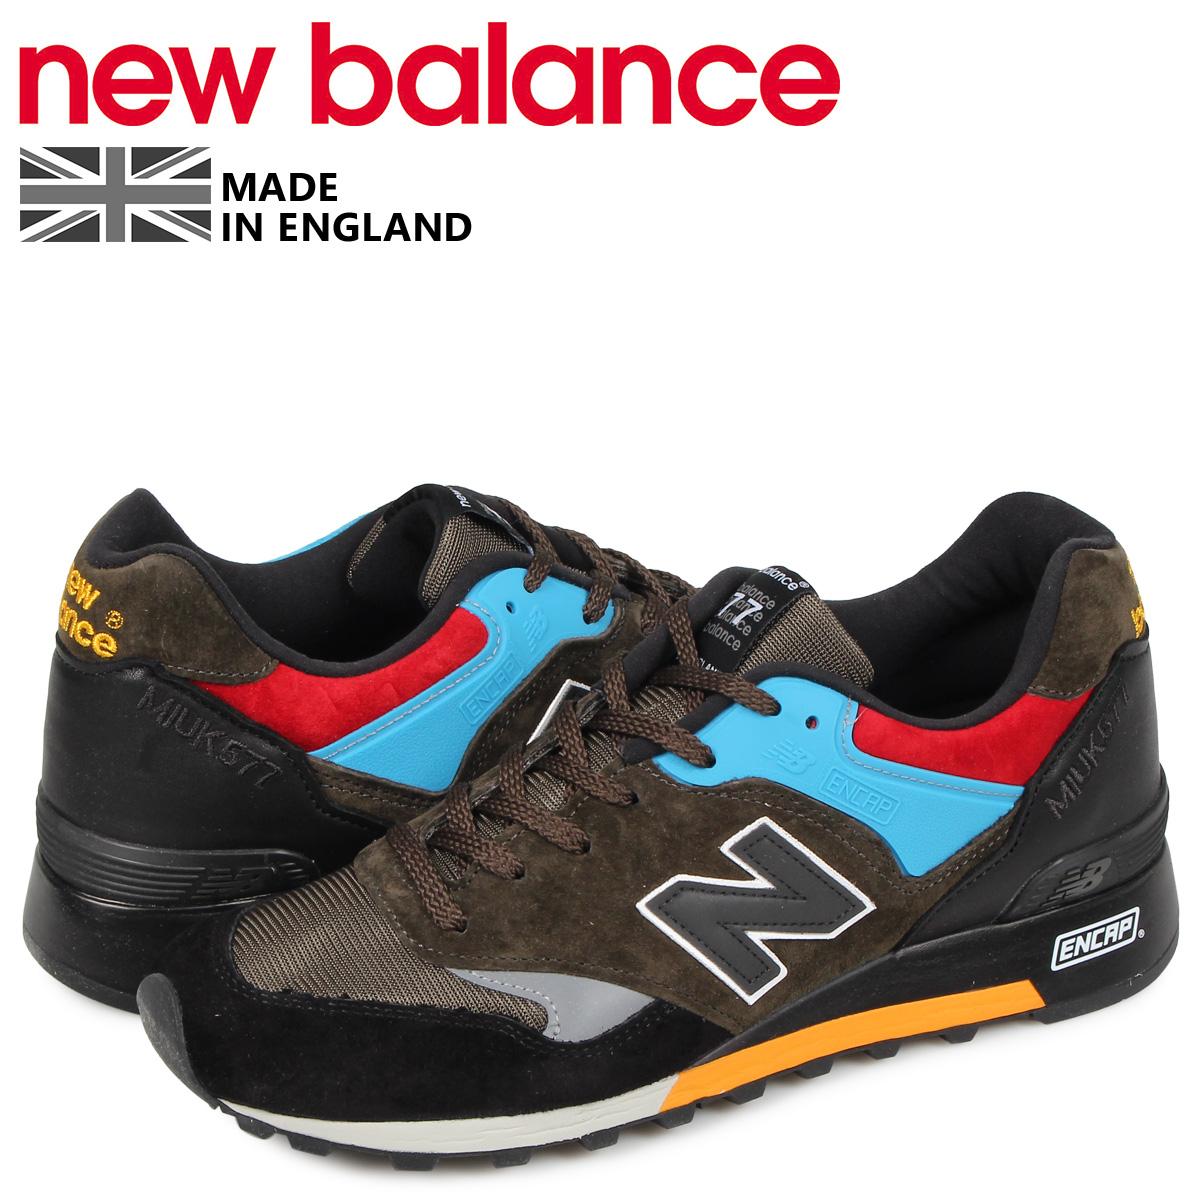 577 new balance